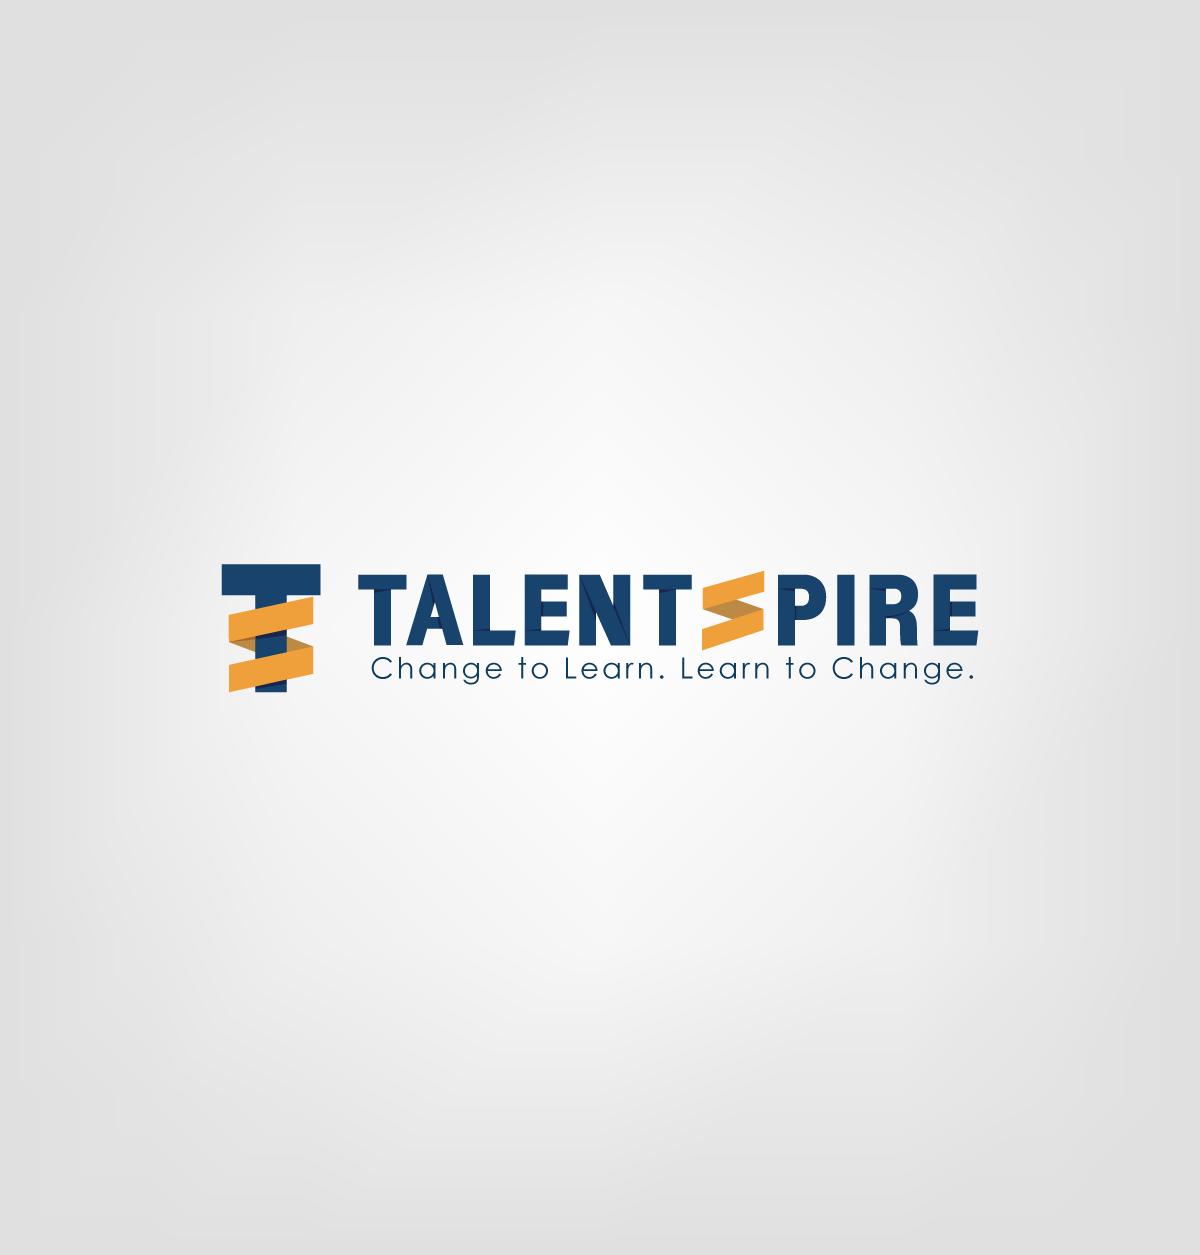 Talentspire